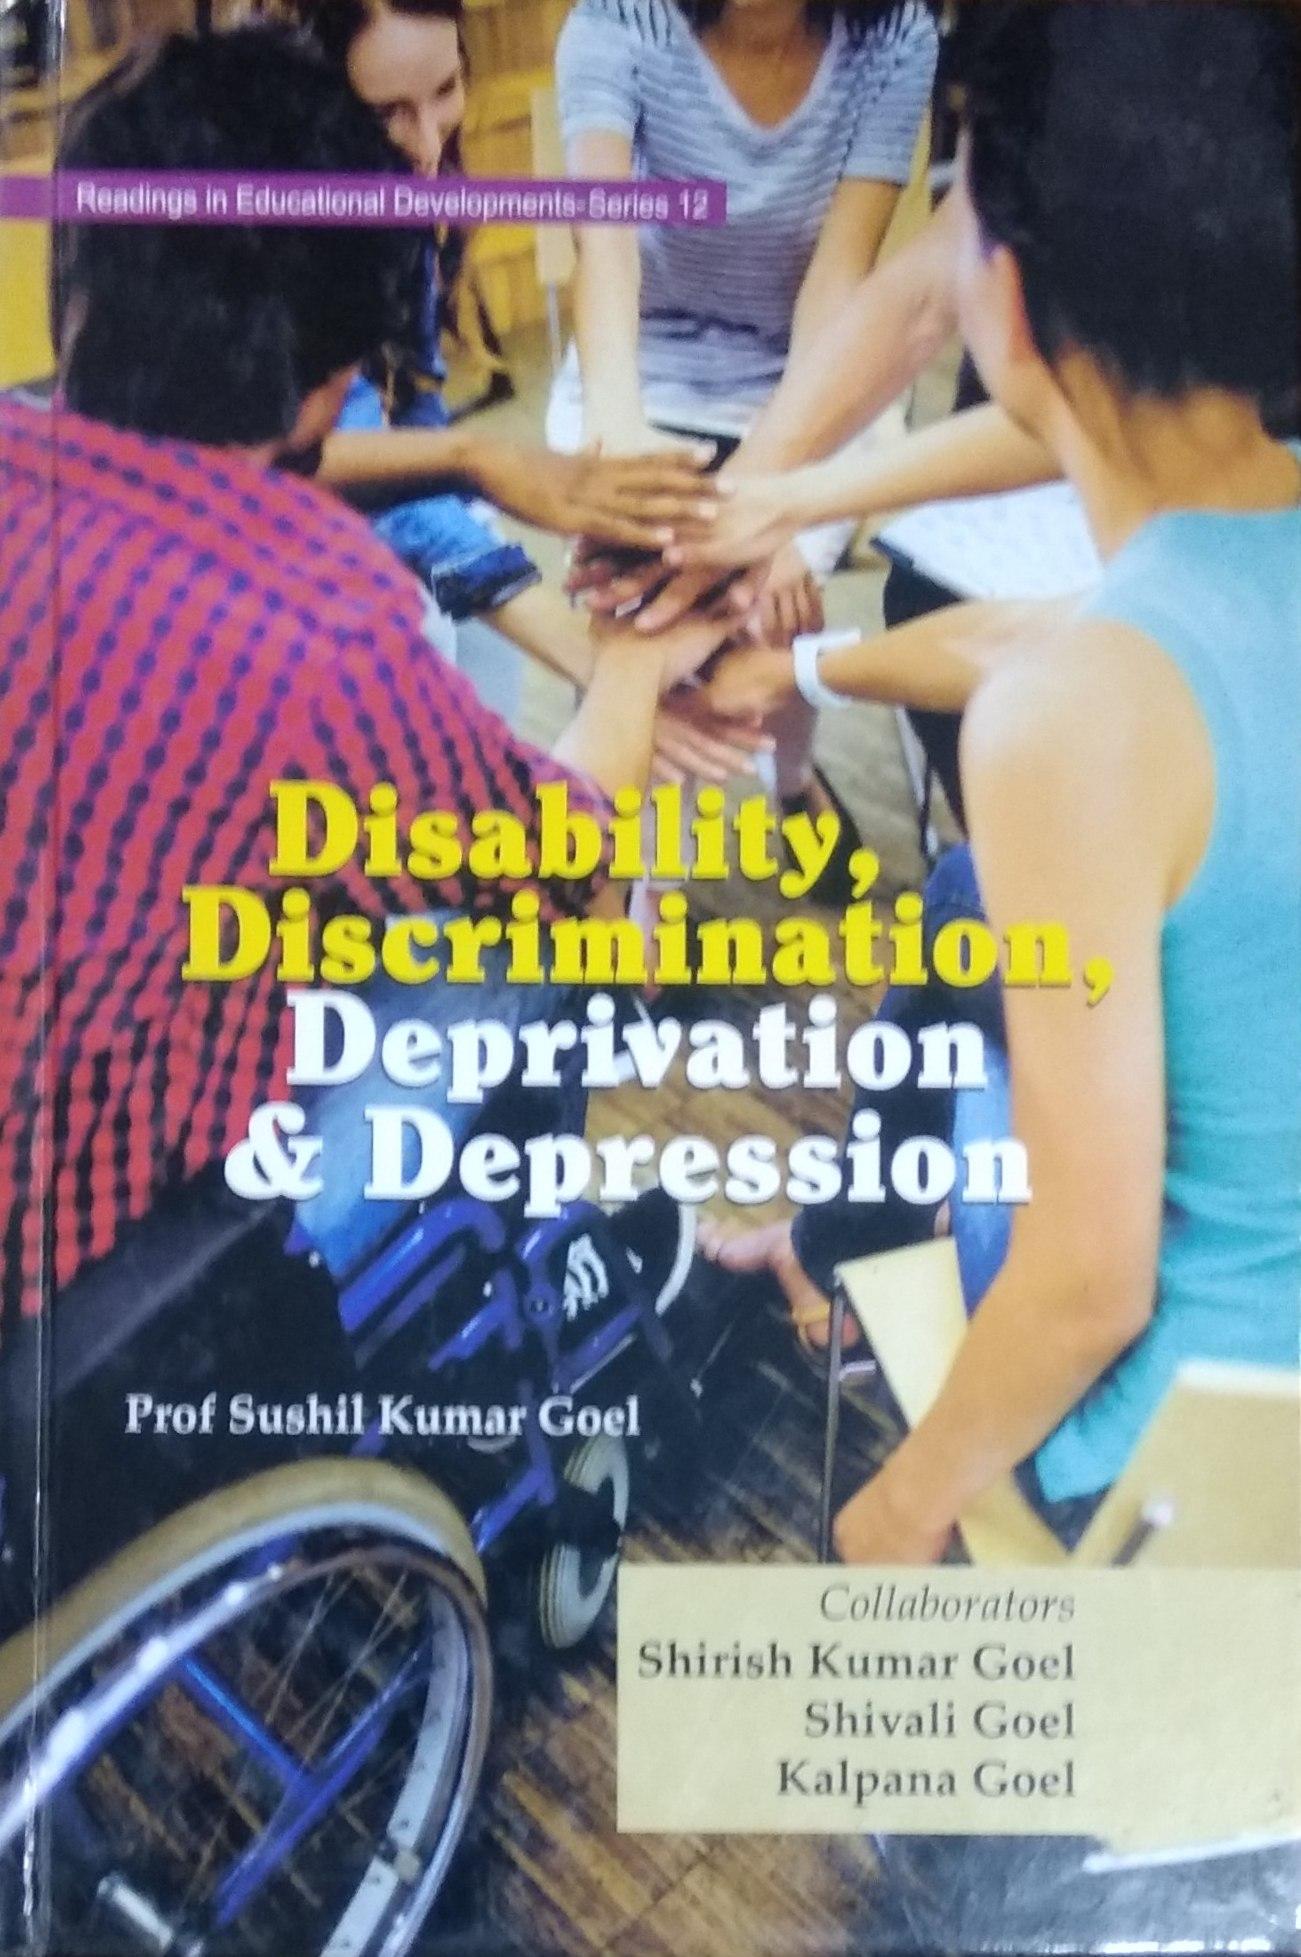 Disability, Discrimination, Deprivation & Depressi…